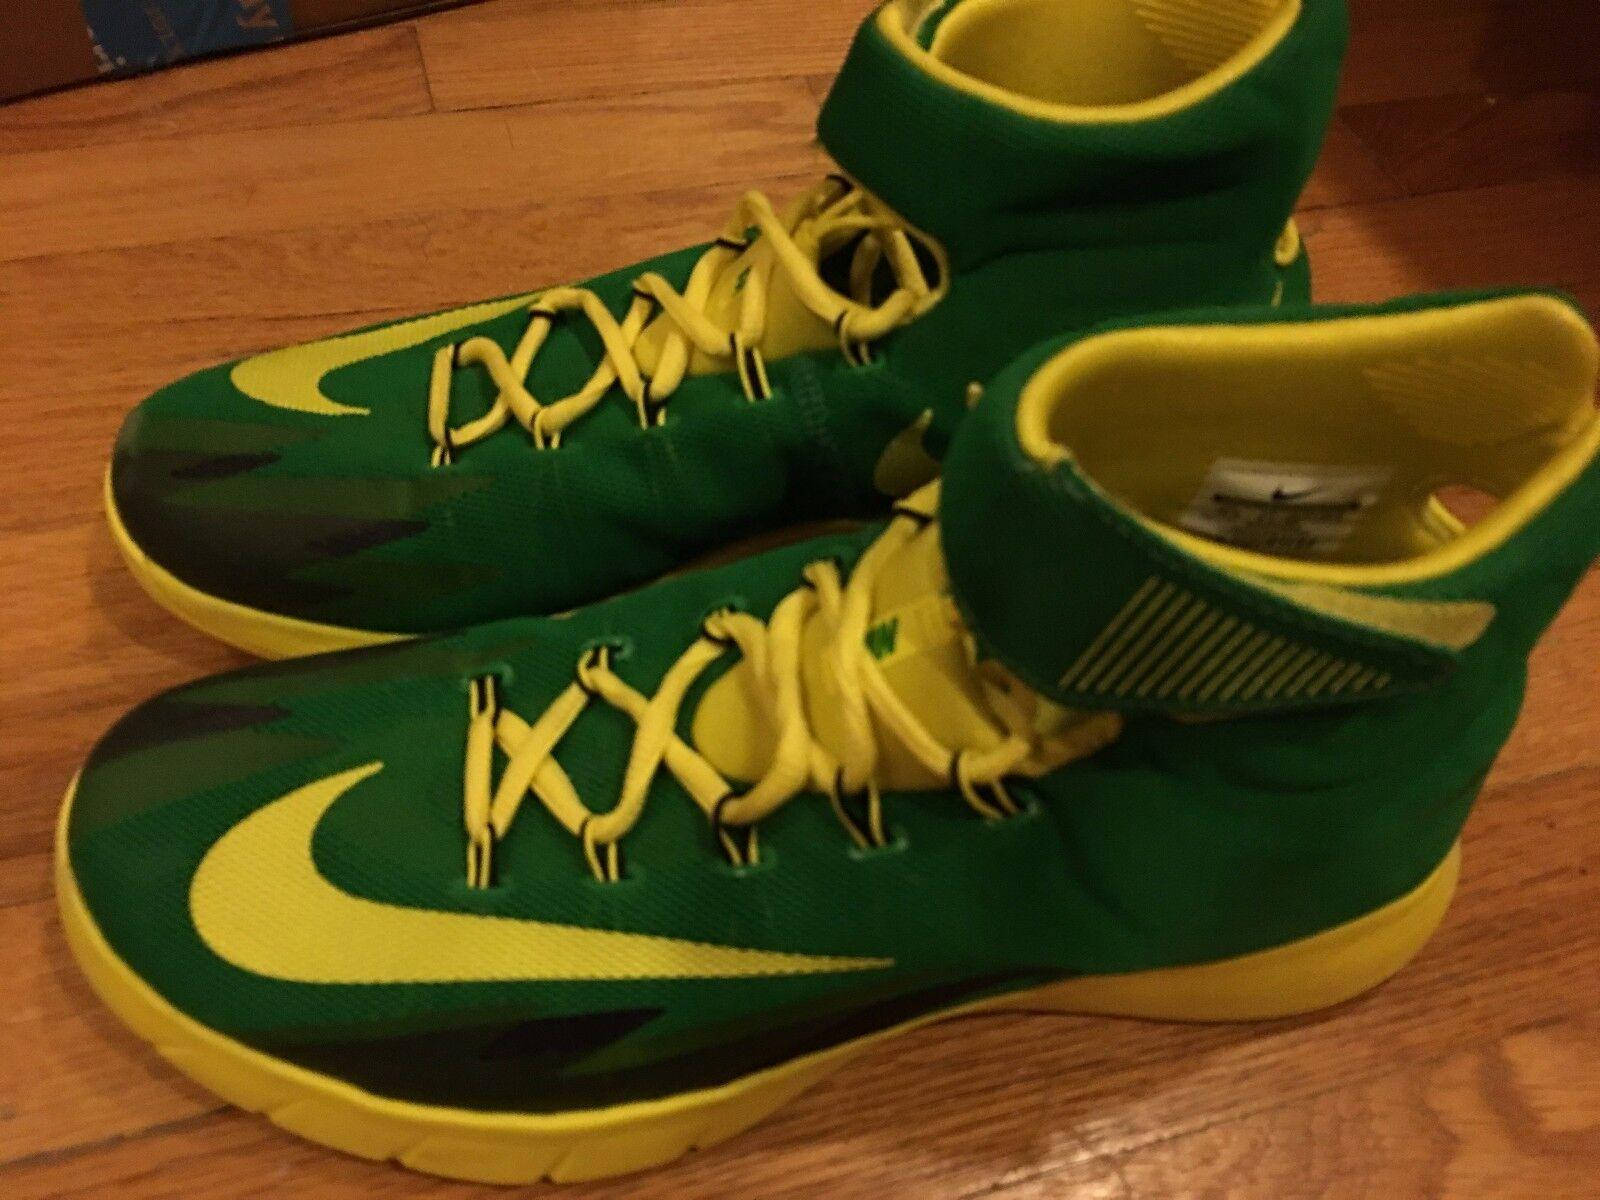 Nike hyperrev OG 2014 Green Yellow VNDS EXCELLENT WORN WORN WORN 2x 5c3c2a